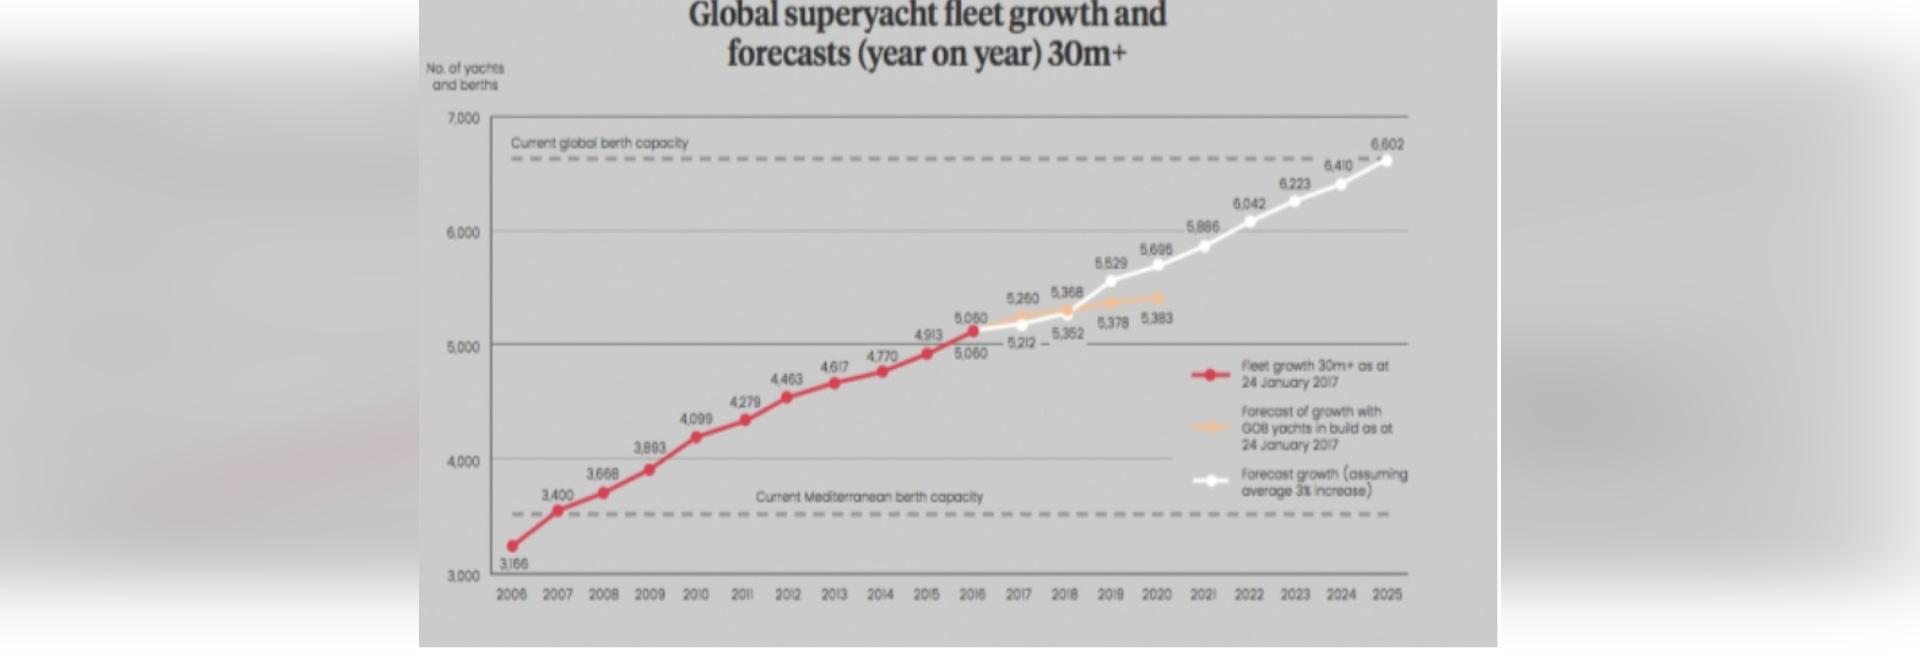 The squeeze on marina capacity